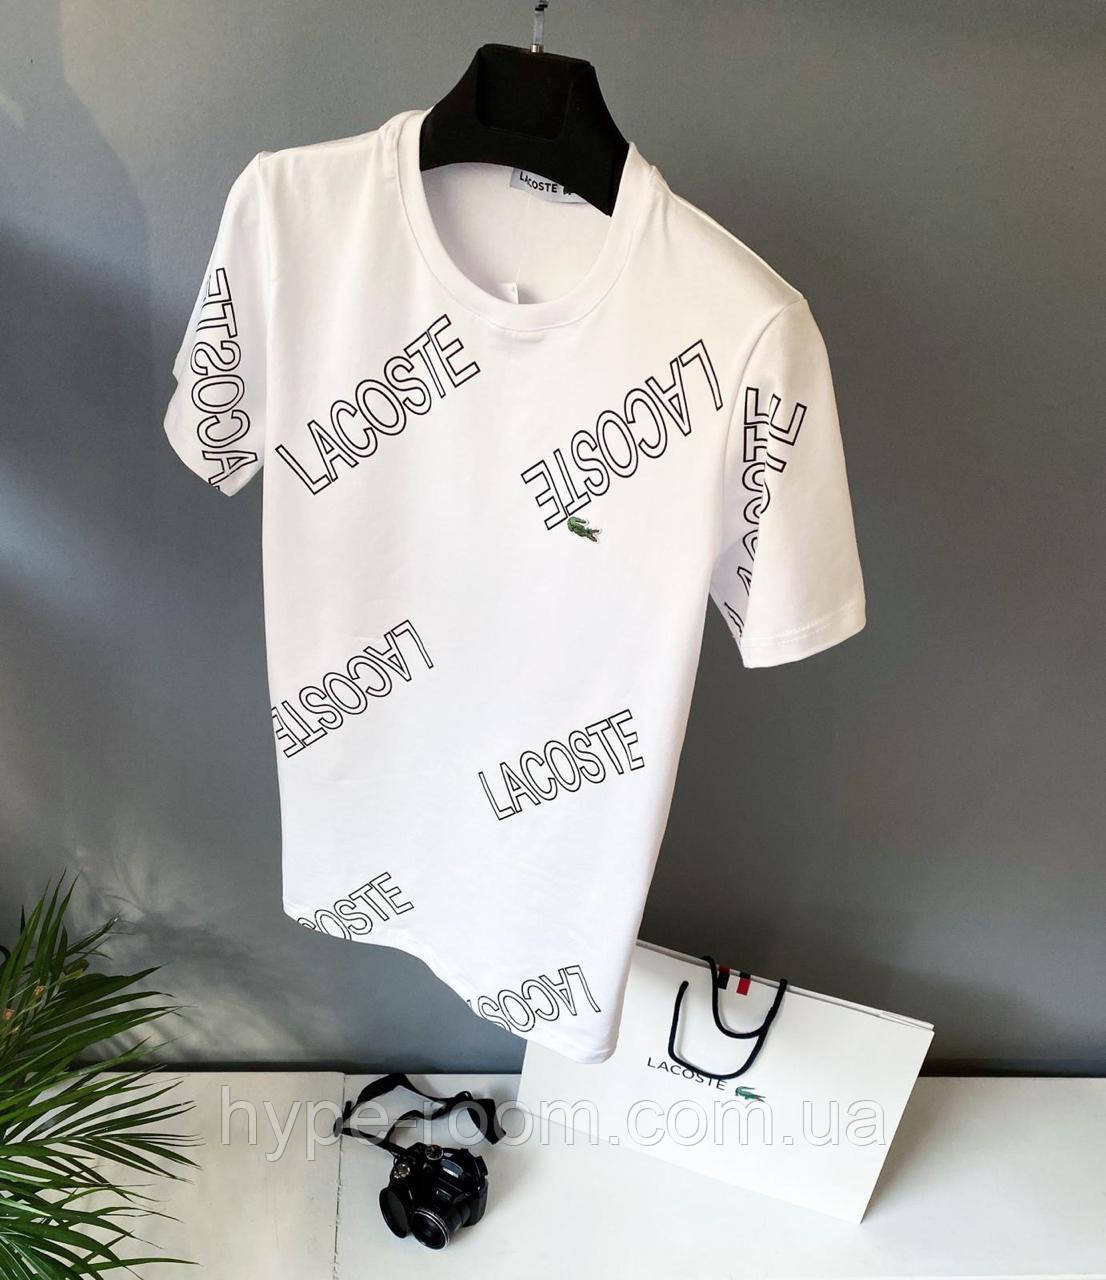 Мужская футболка в стиле Lacoste белая(размер XL,XXL)